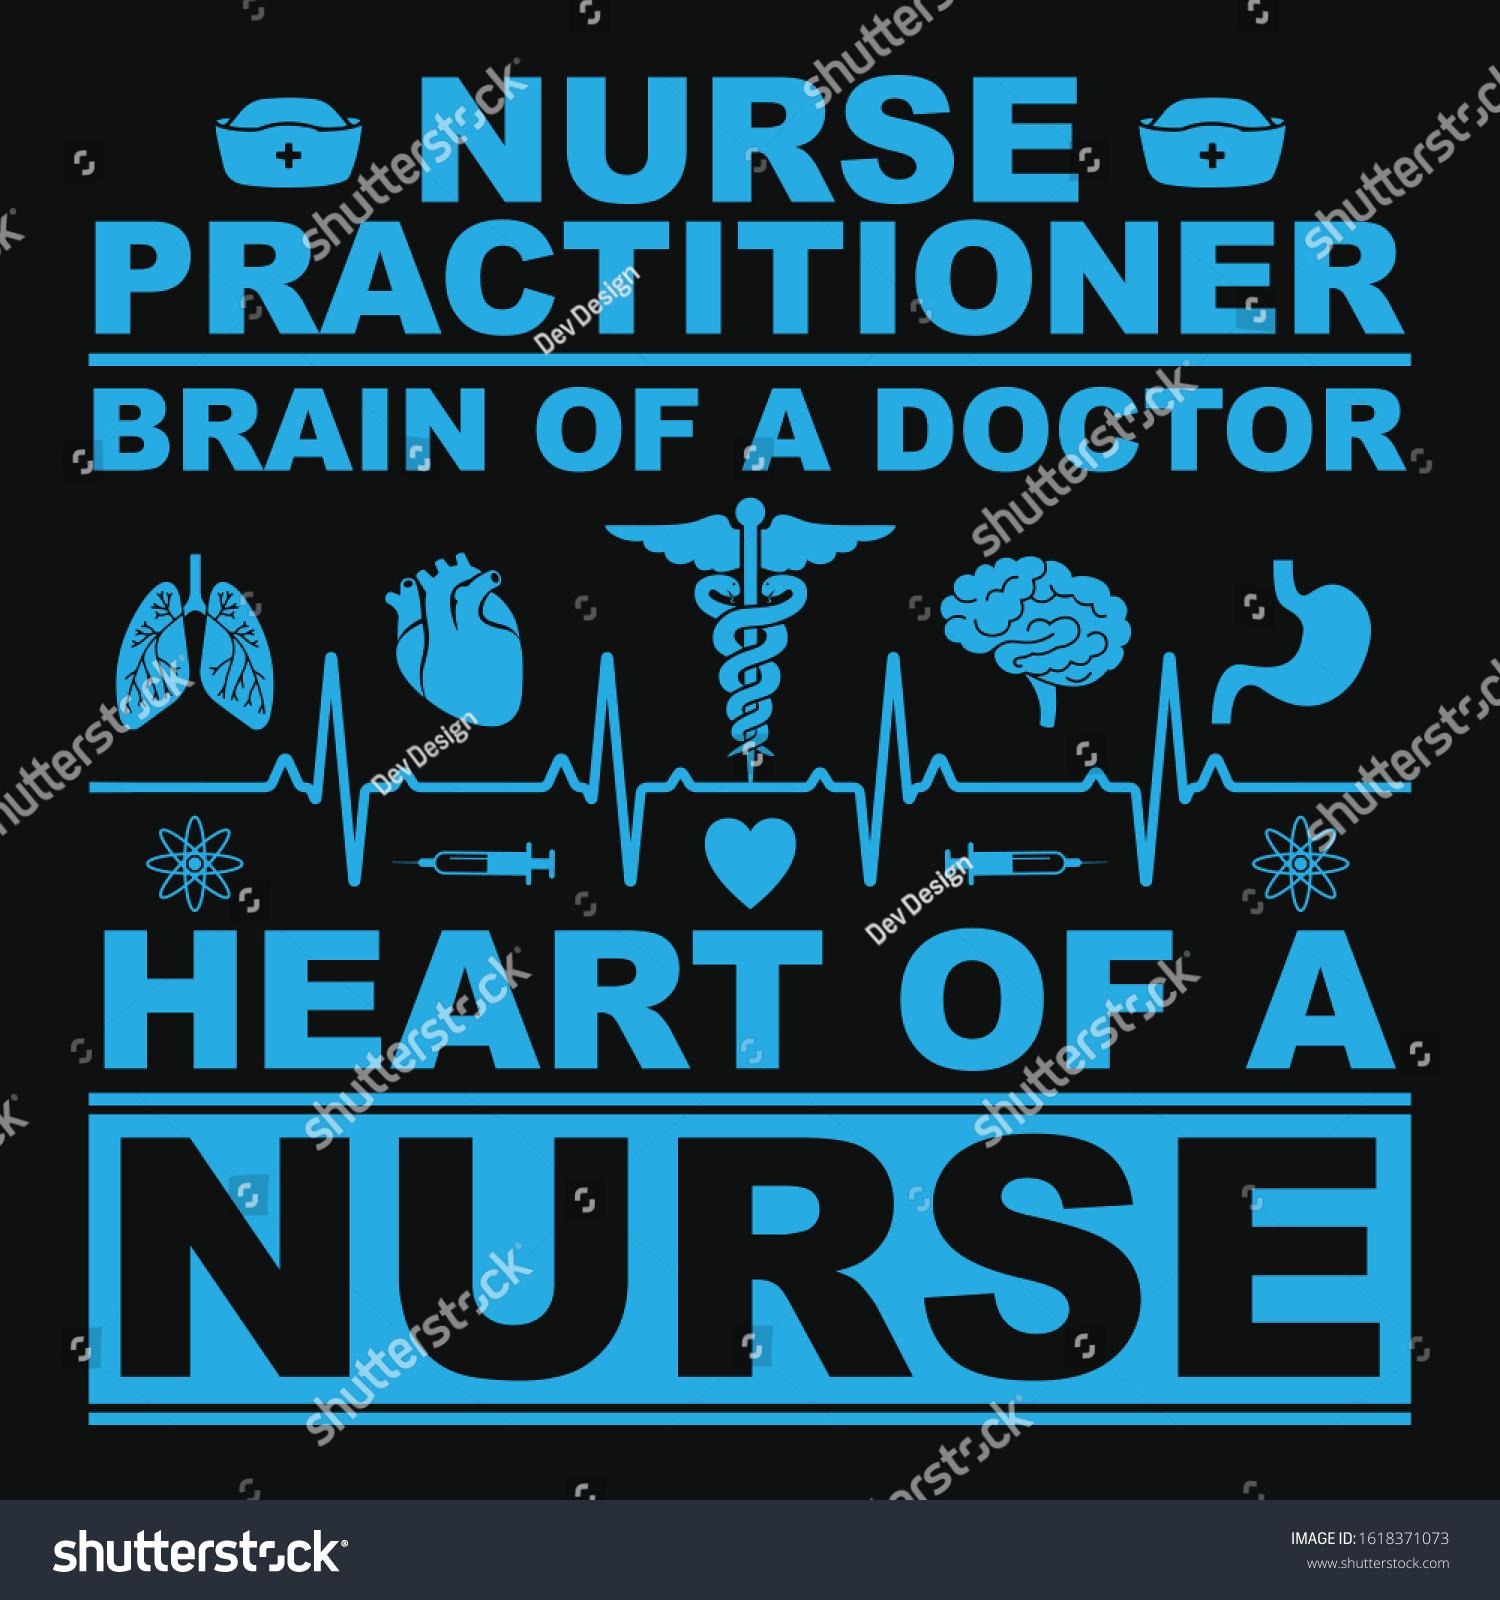 Nurse Practitioner Tshirt Design Nurse Tshirt Stock Vector Royalty Free 1618371073,Professional Creative Graphic Designer Letterhead Design